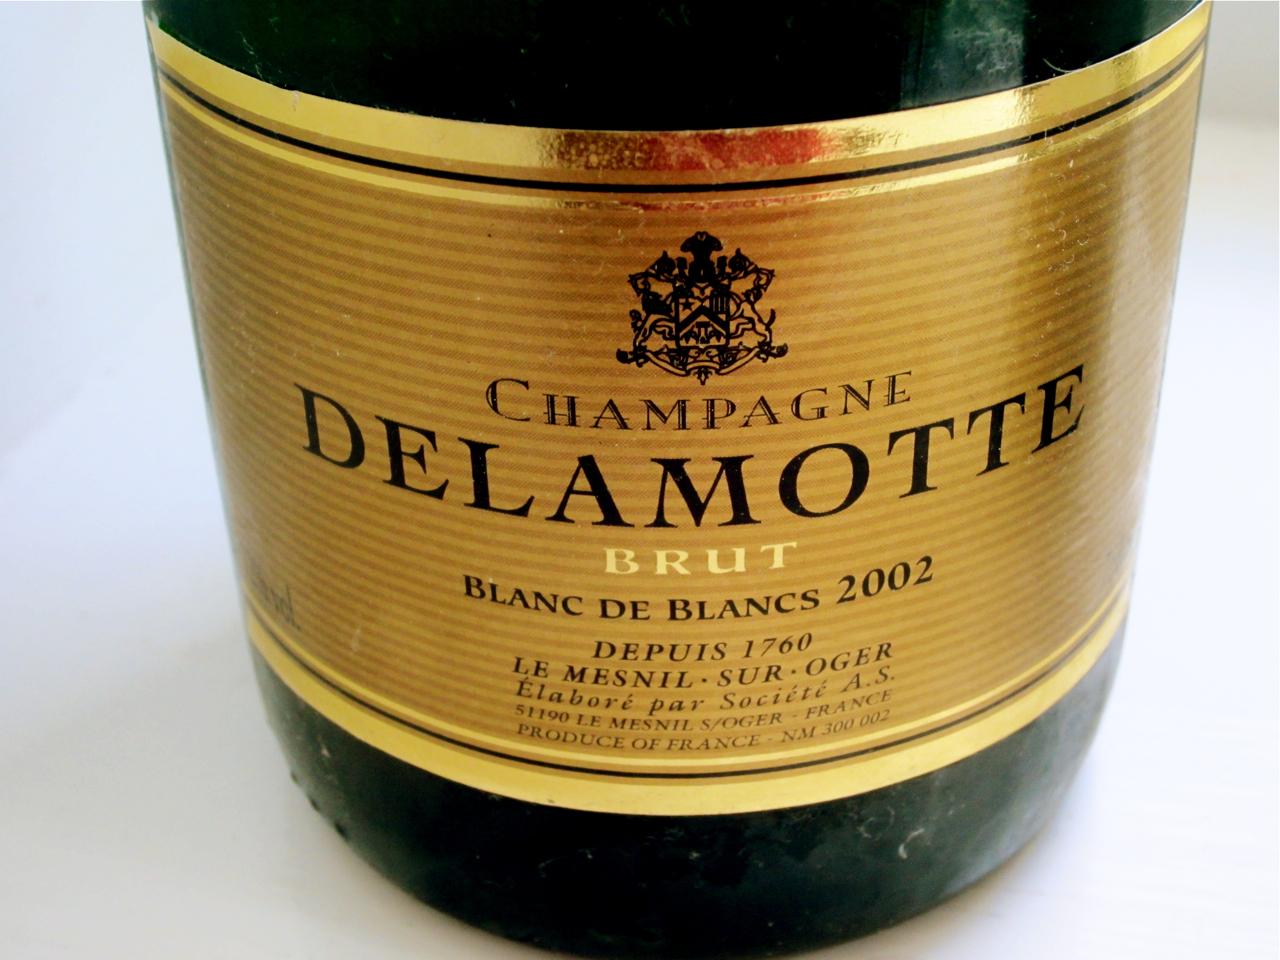 Delamotte 2002 Blanc De Blancs Brut Champane Image Source